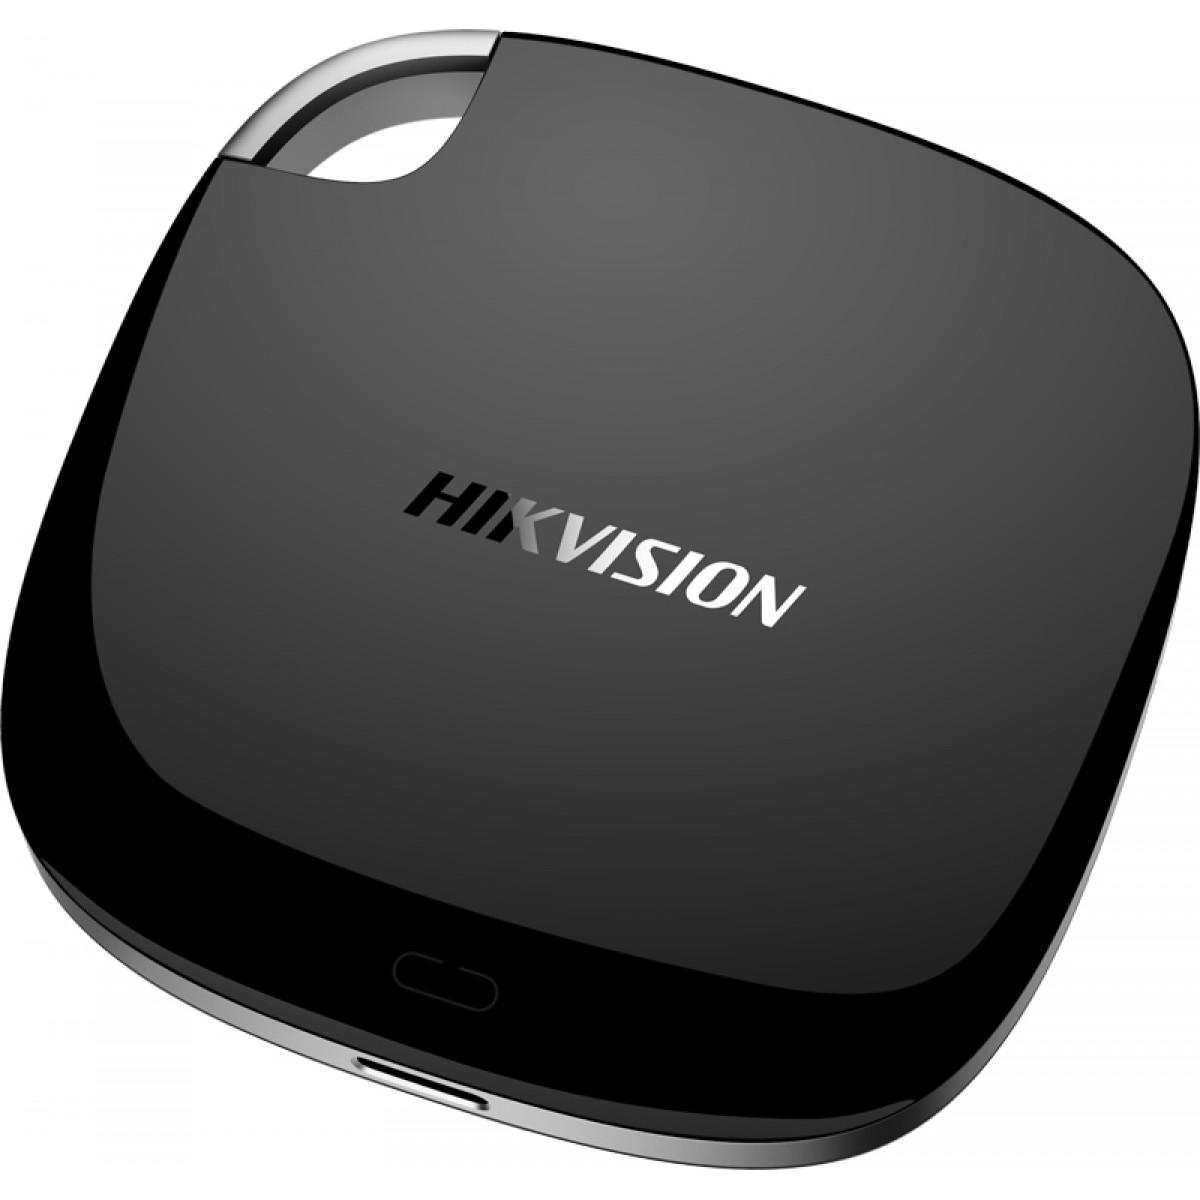 SSD Externo Portátil Hikvision T100I 480GB, USB 3.1